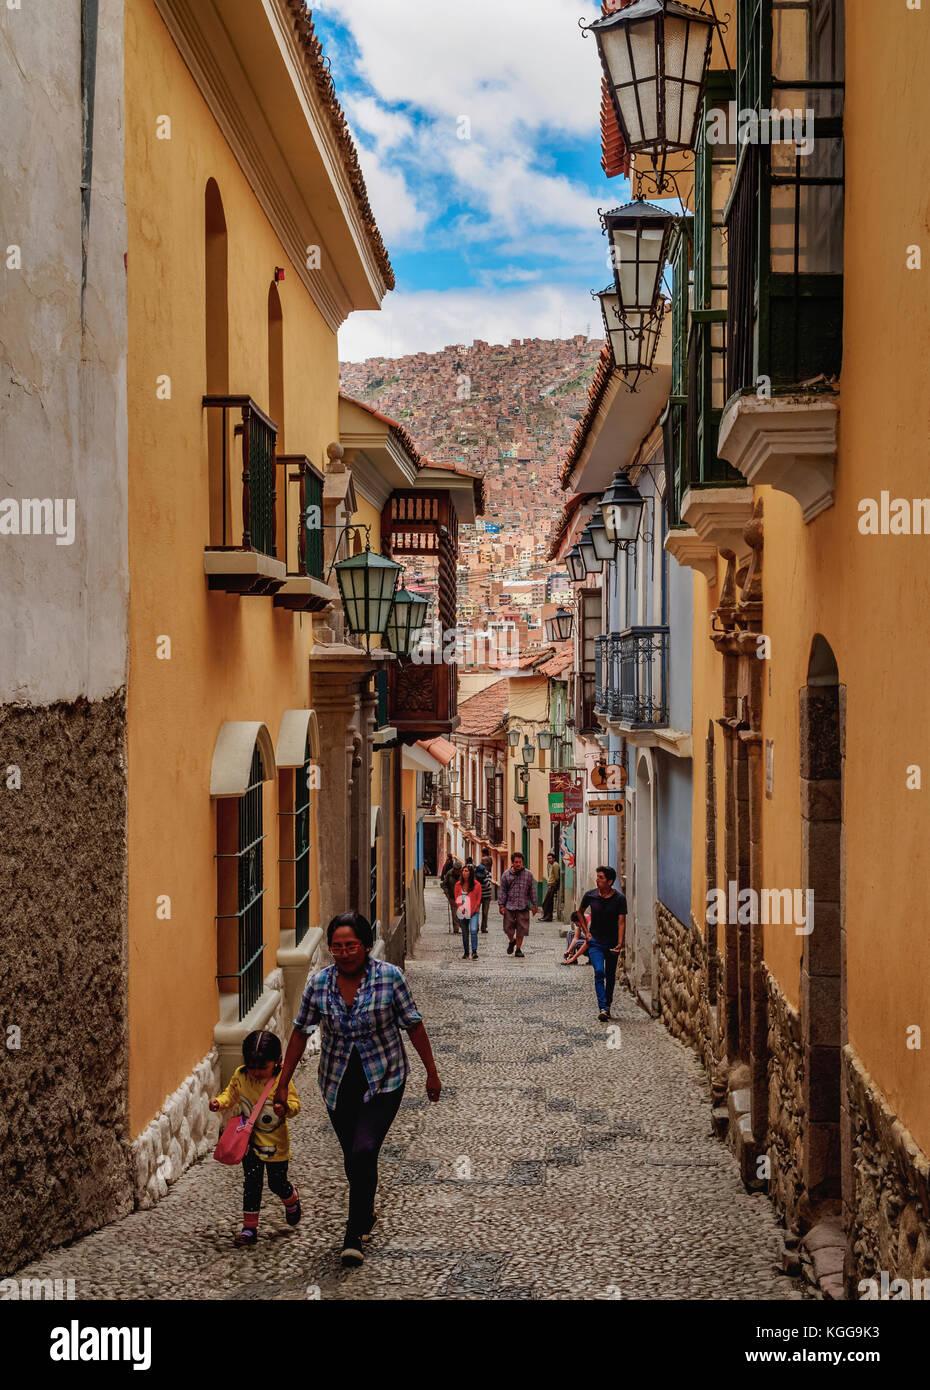 Calle Jaen, Old Town, La Paz, Bolivia - Stock Image